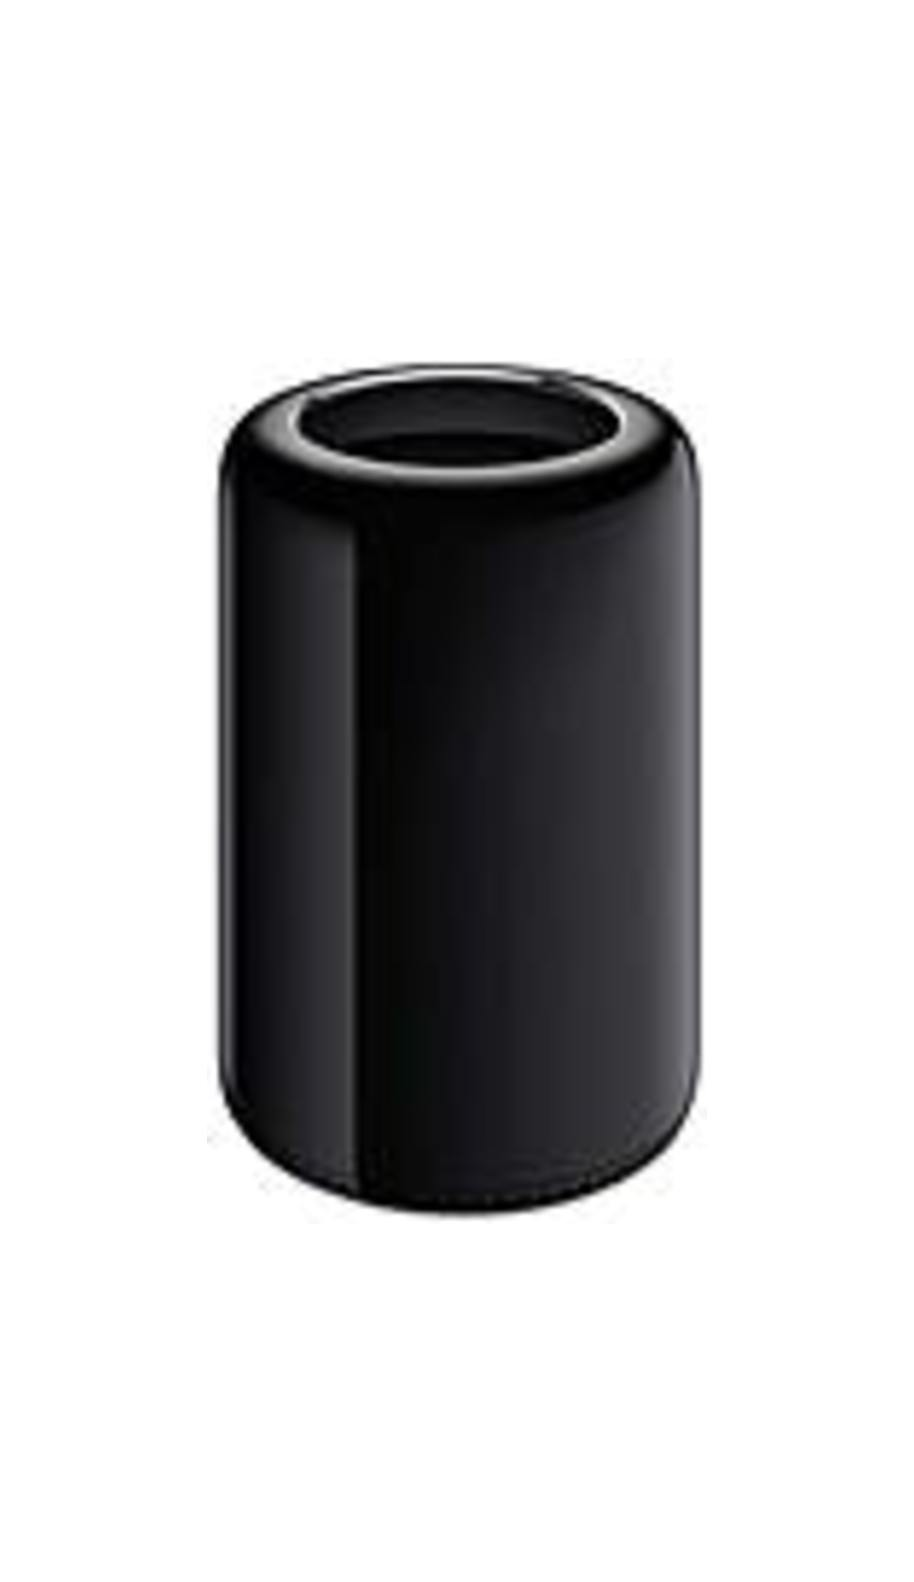 Apple Mac Pro Z0P80006A Desktop PC - Intel Xeon E5-1650v2 3.5 GHz Hexa-Core Processor - 64 GB DDR3 SDRAM - 1 TB Solid State Drive - OS X 10.9.1